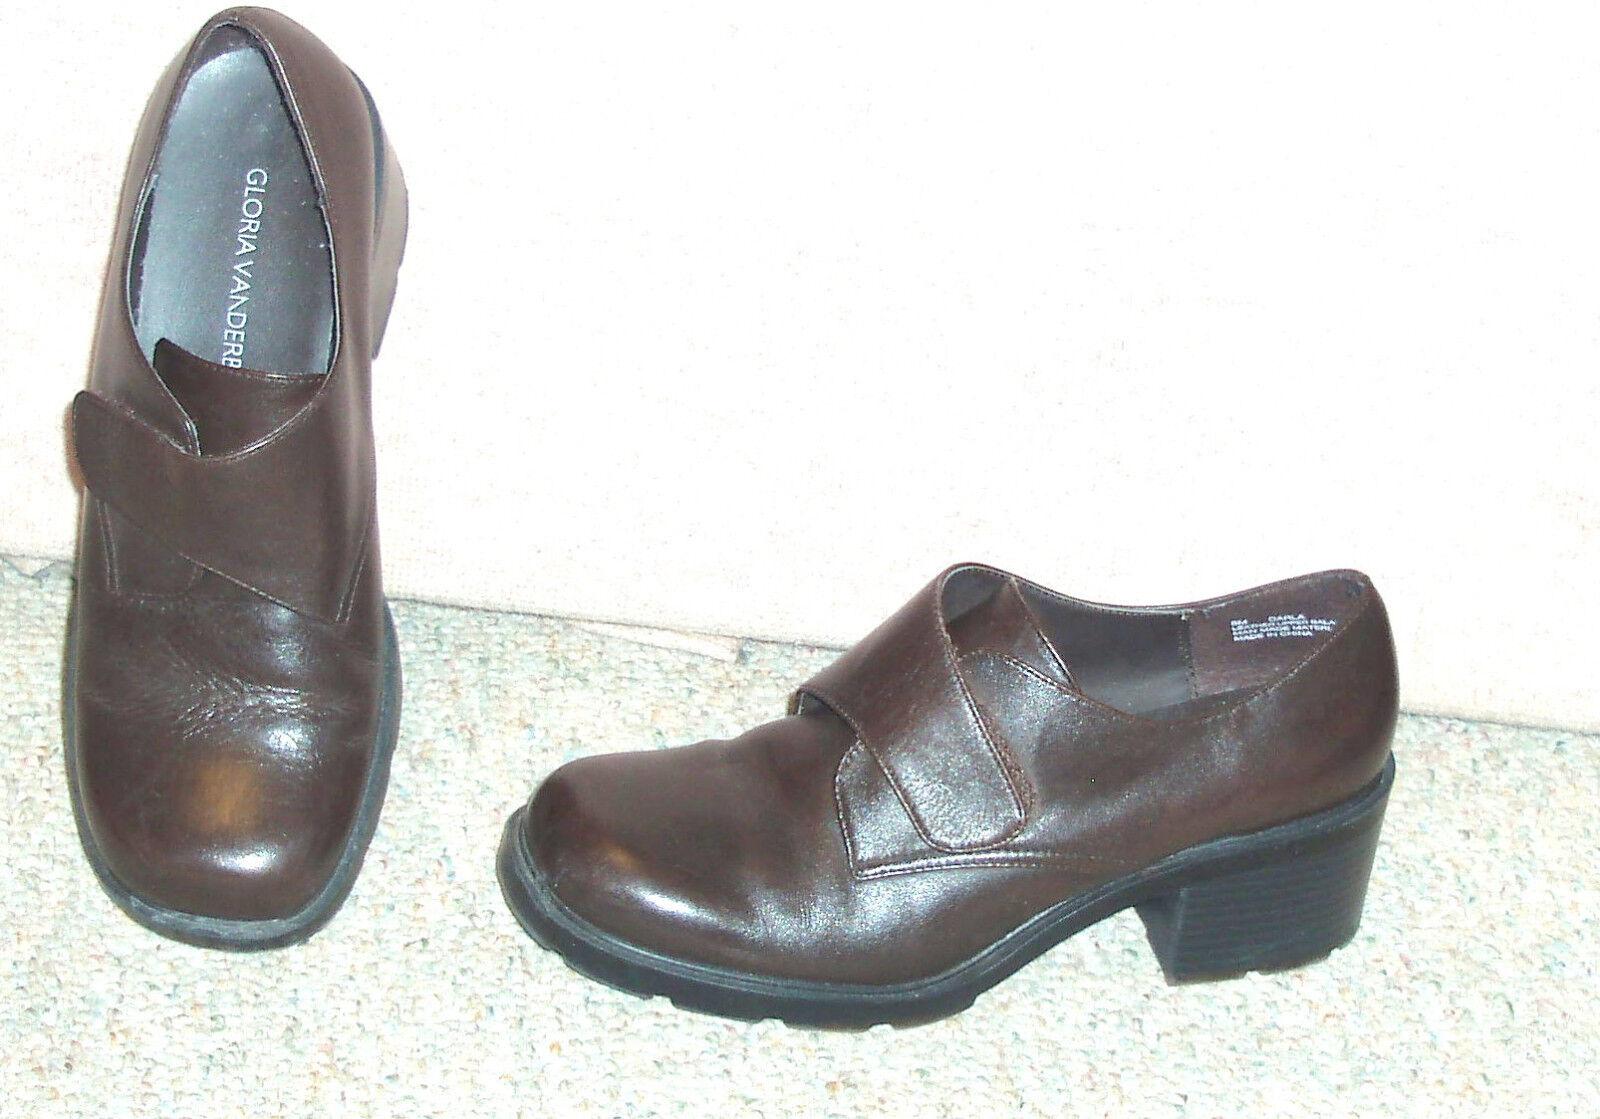 Women's brown leather / upper GLORIA VANDERBILT shoes / leather heels , sz 8 M fb21ca